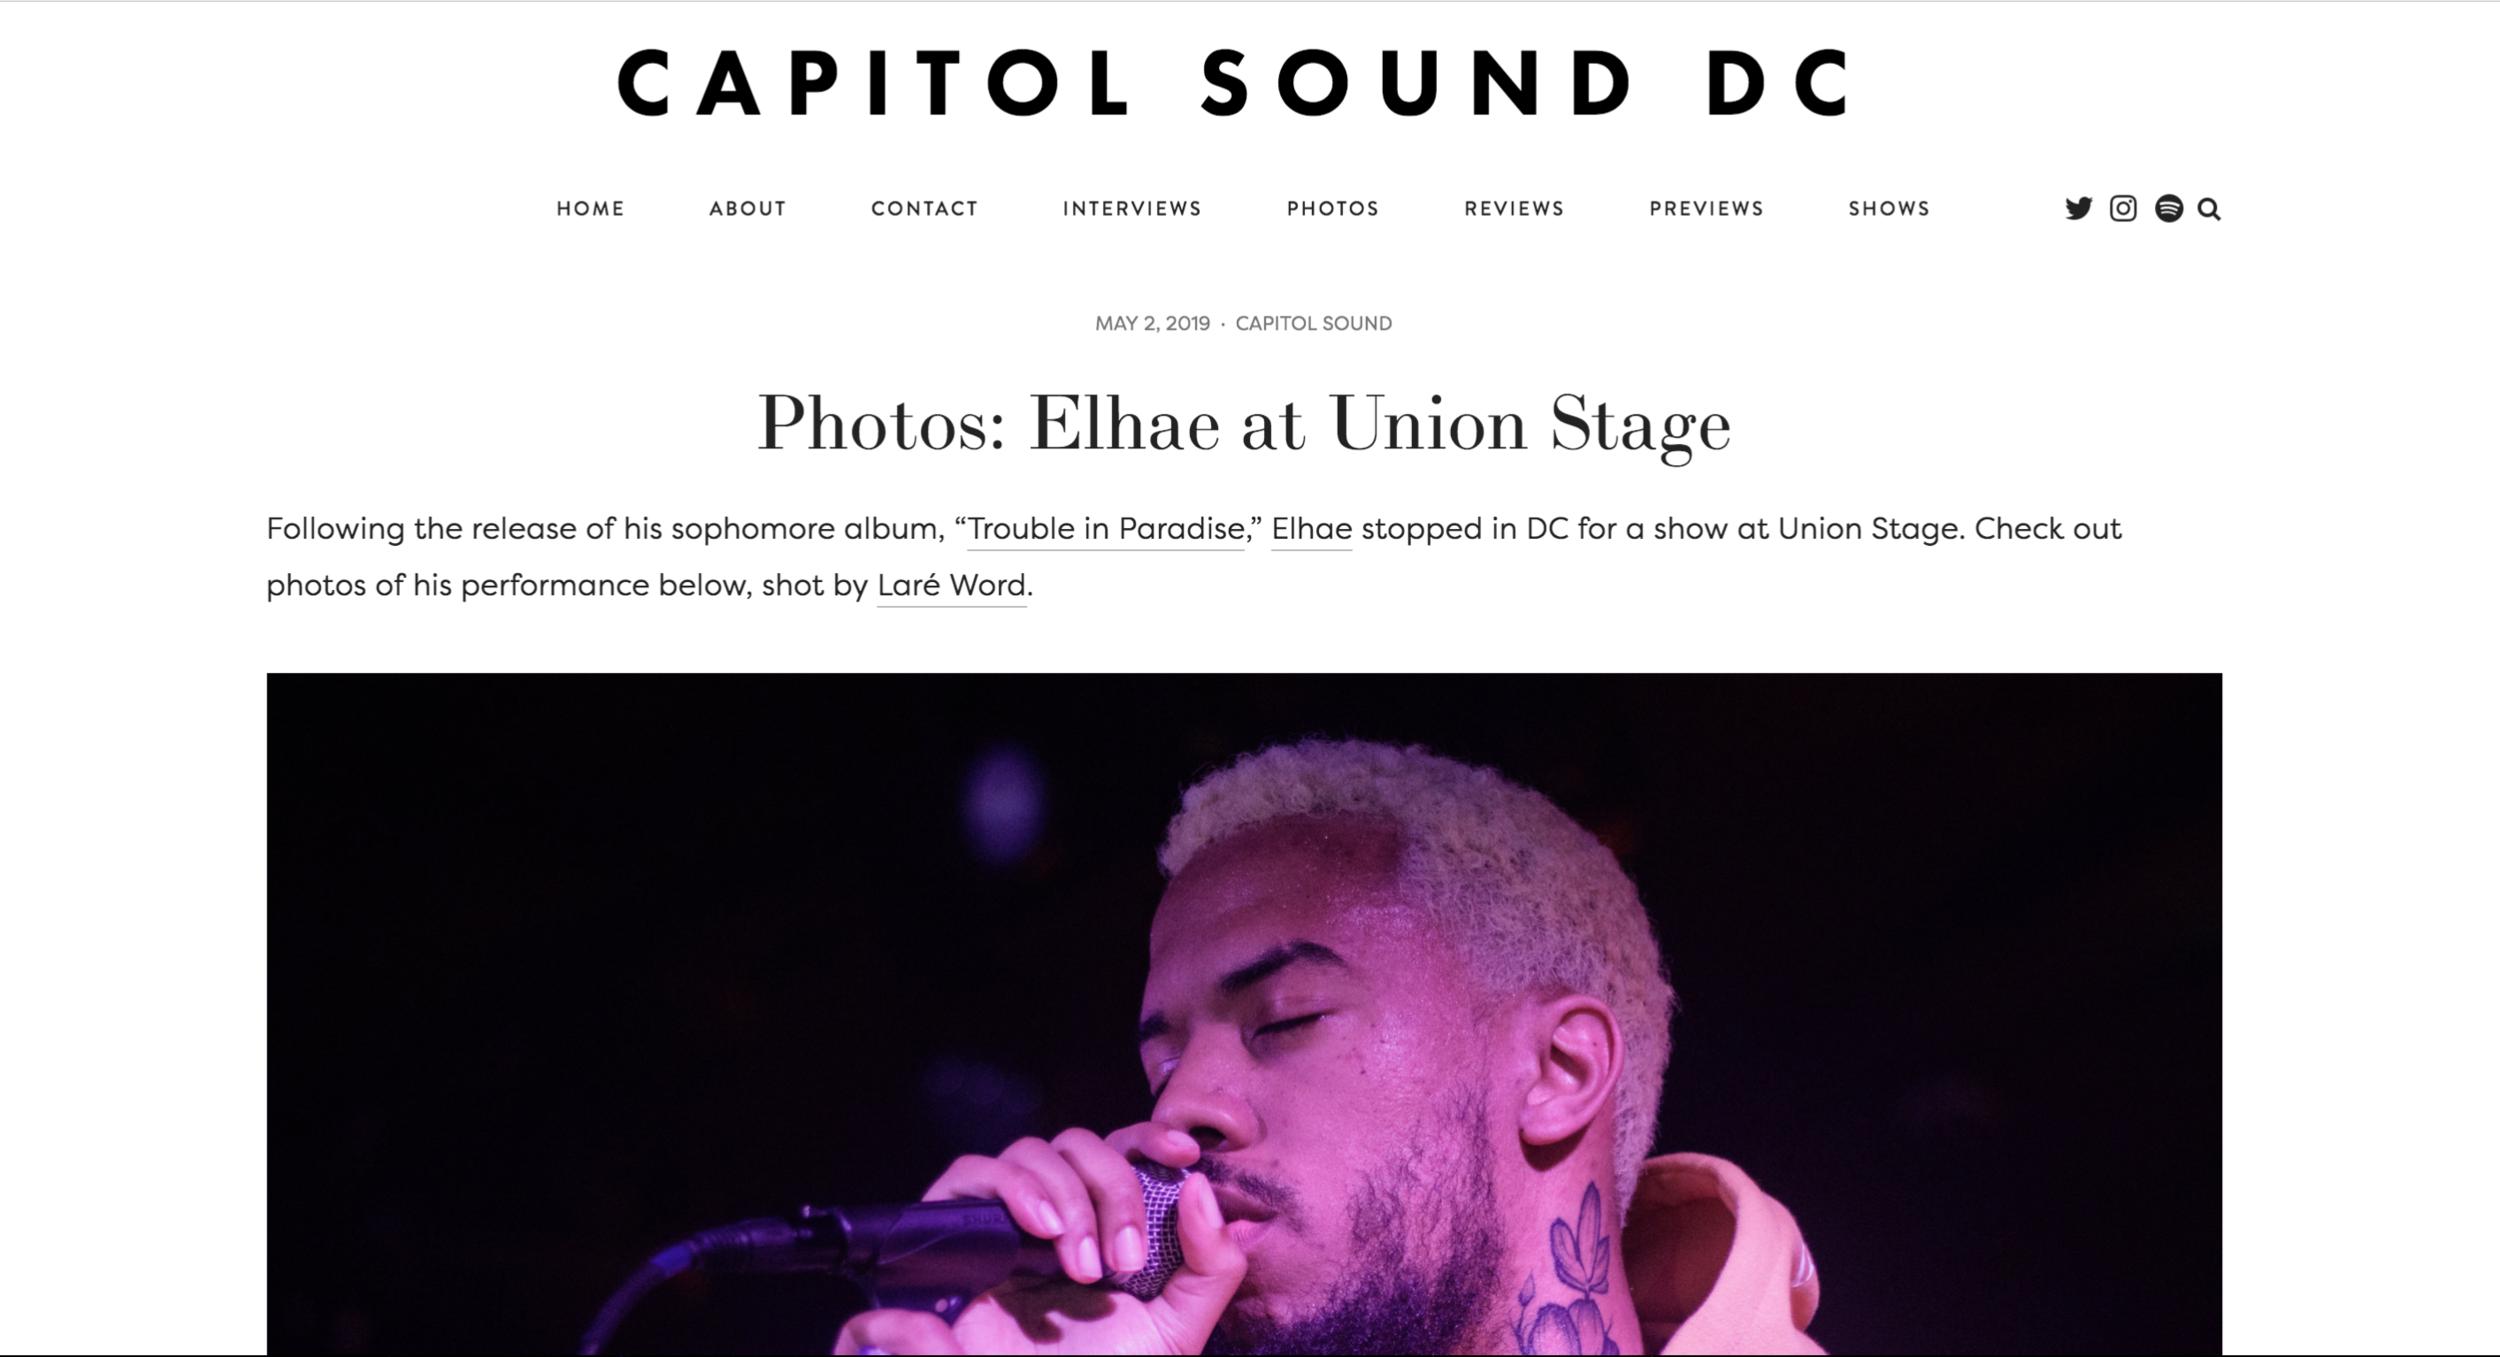 https://capitolsounddc.com/capitol-sound/2019/photos-elhae-at-union-stage